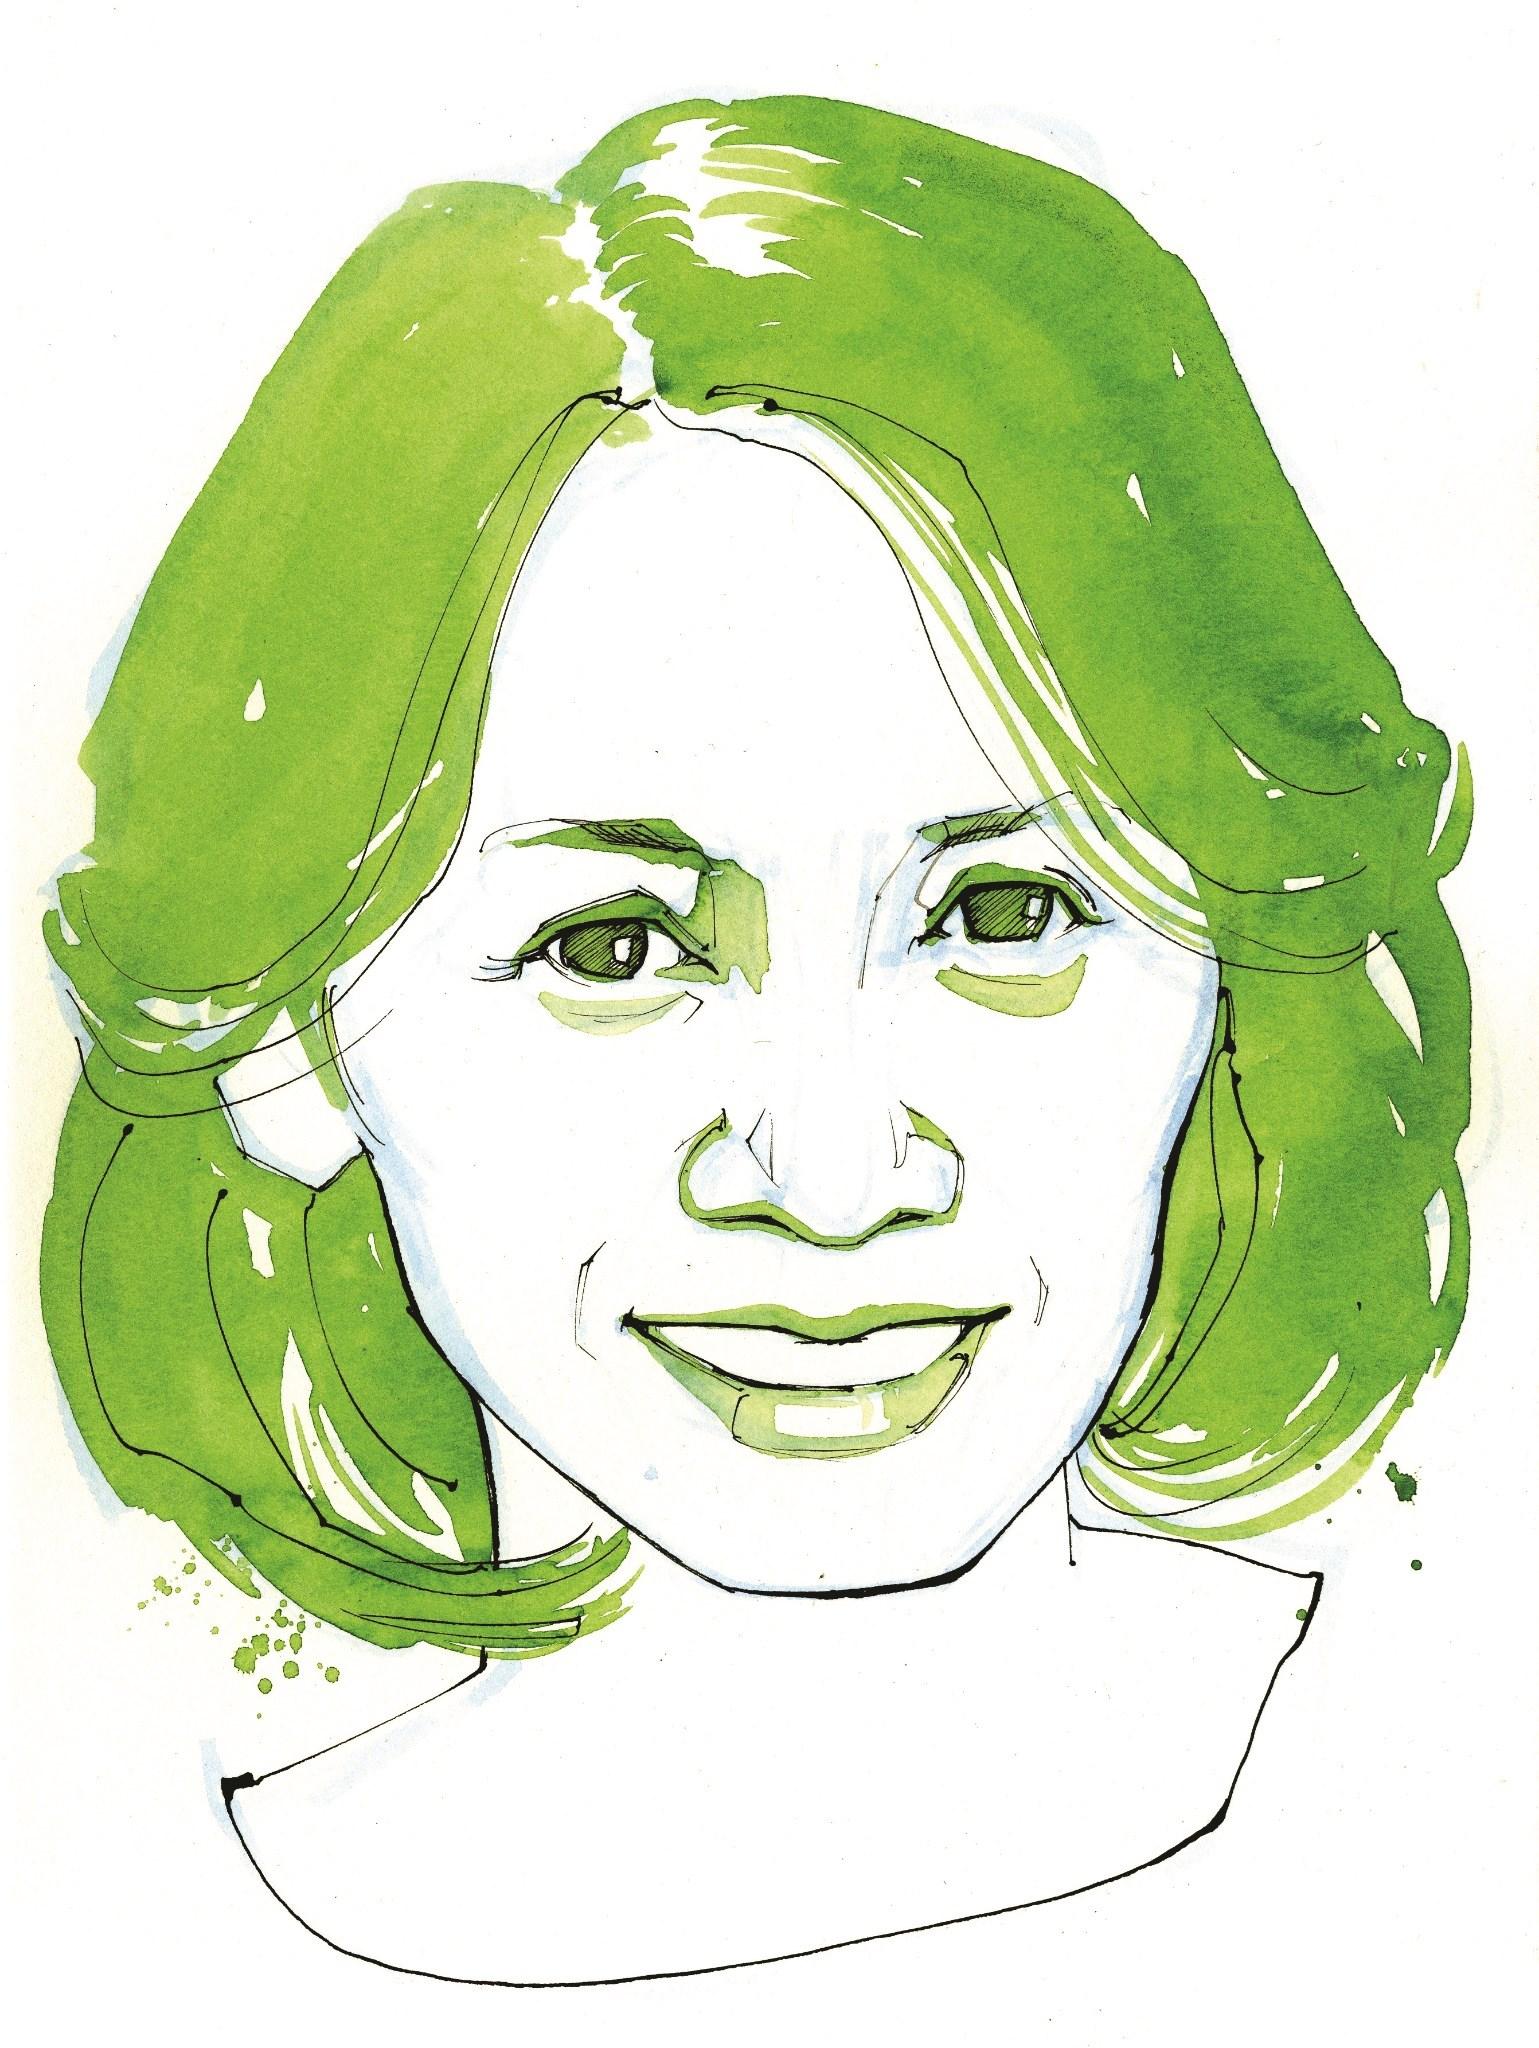 Michelle Crouthamel